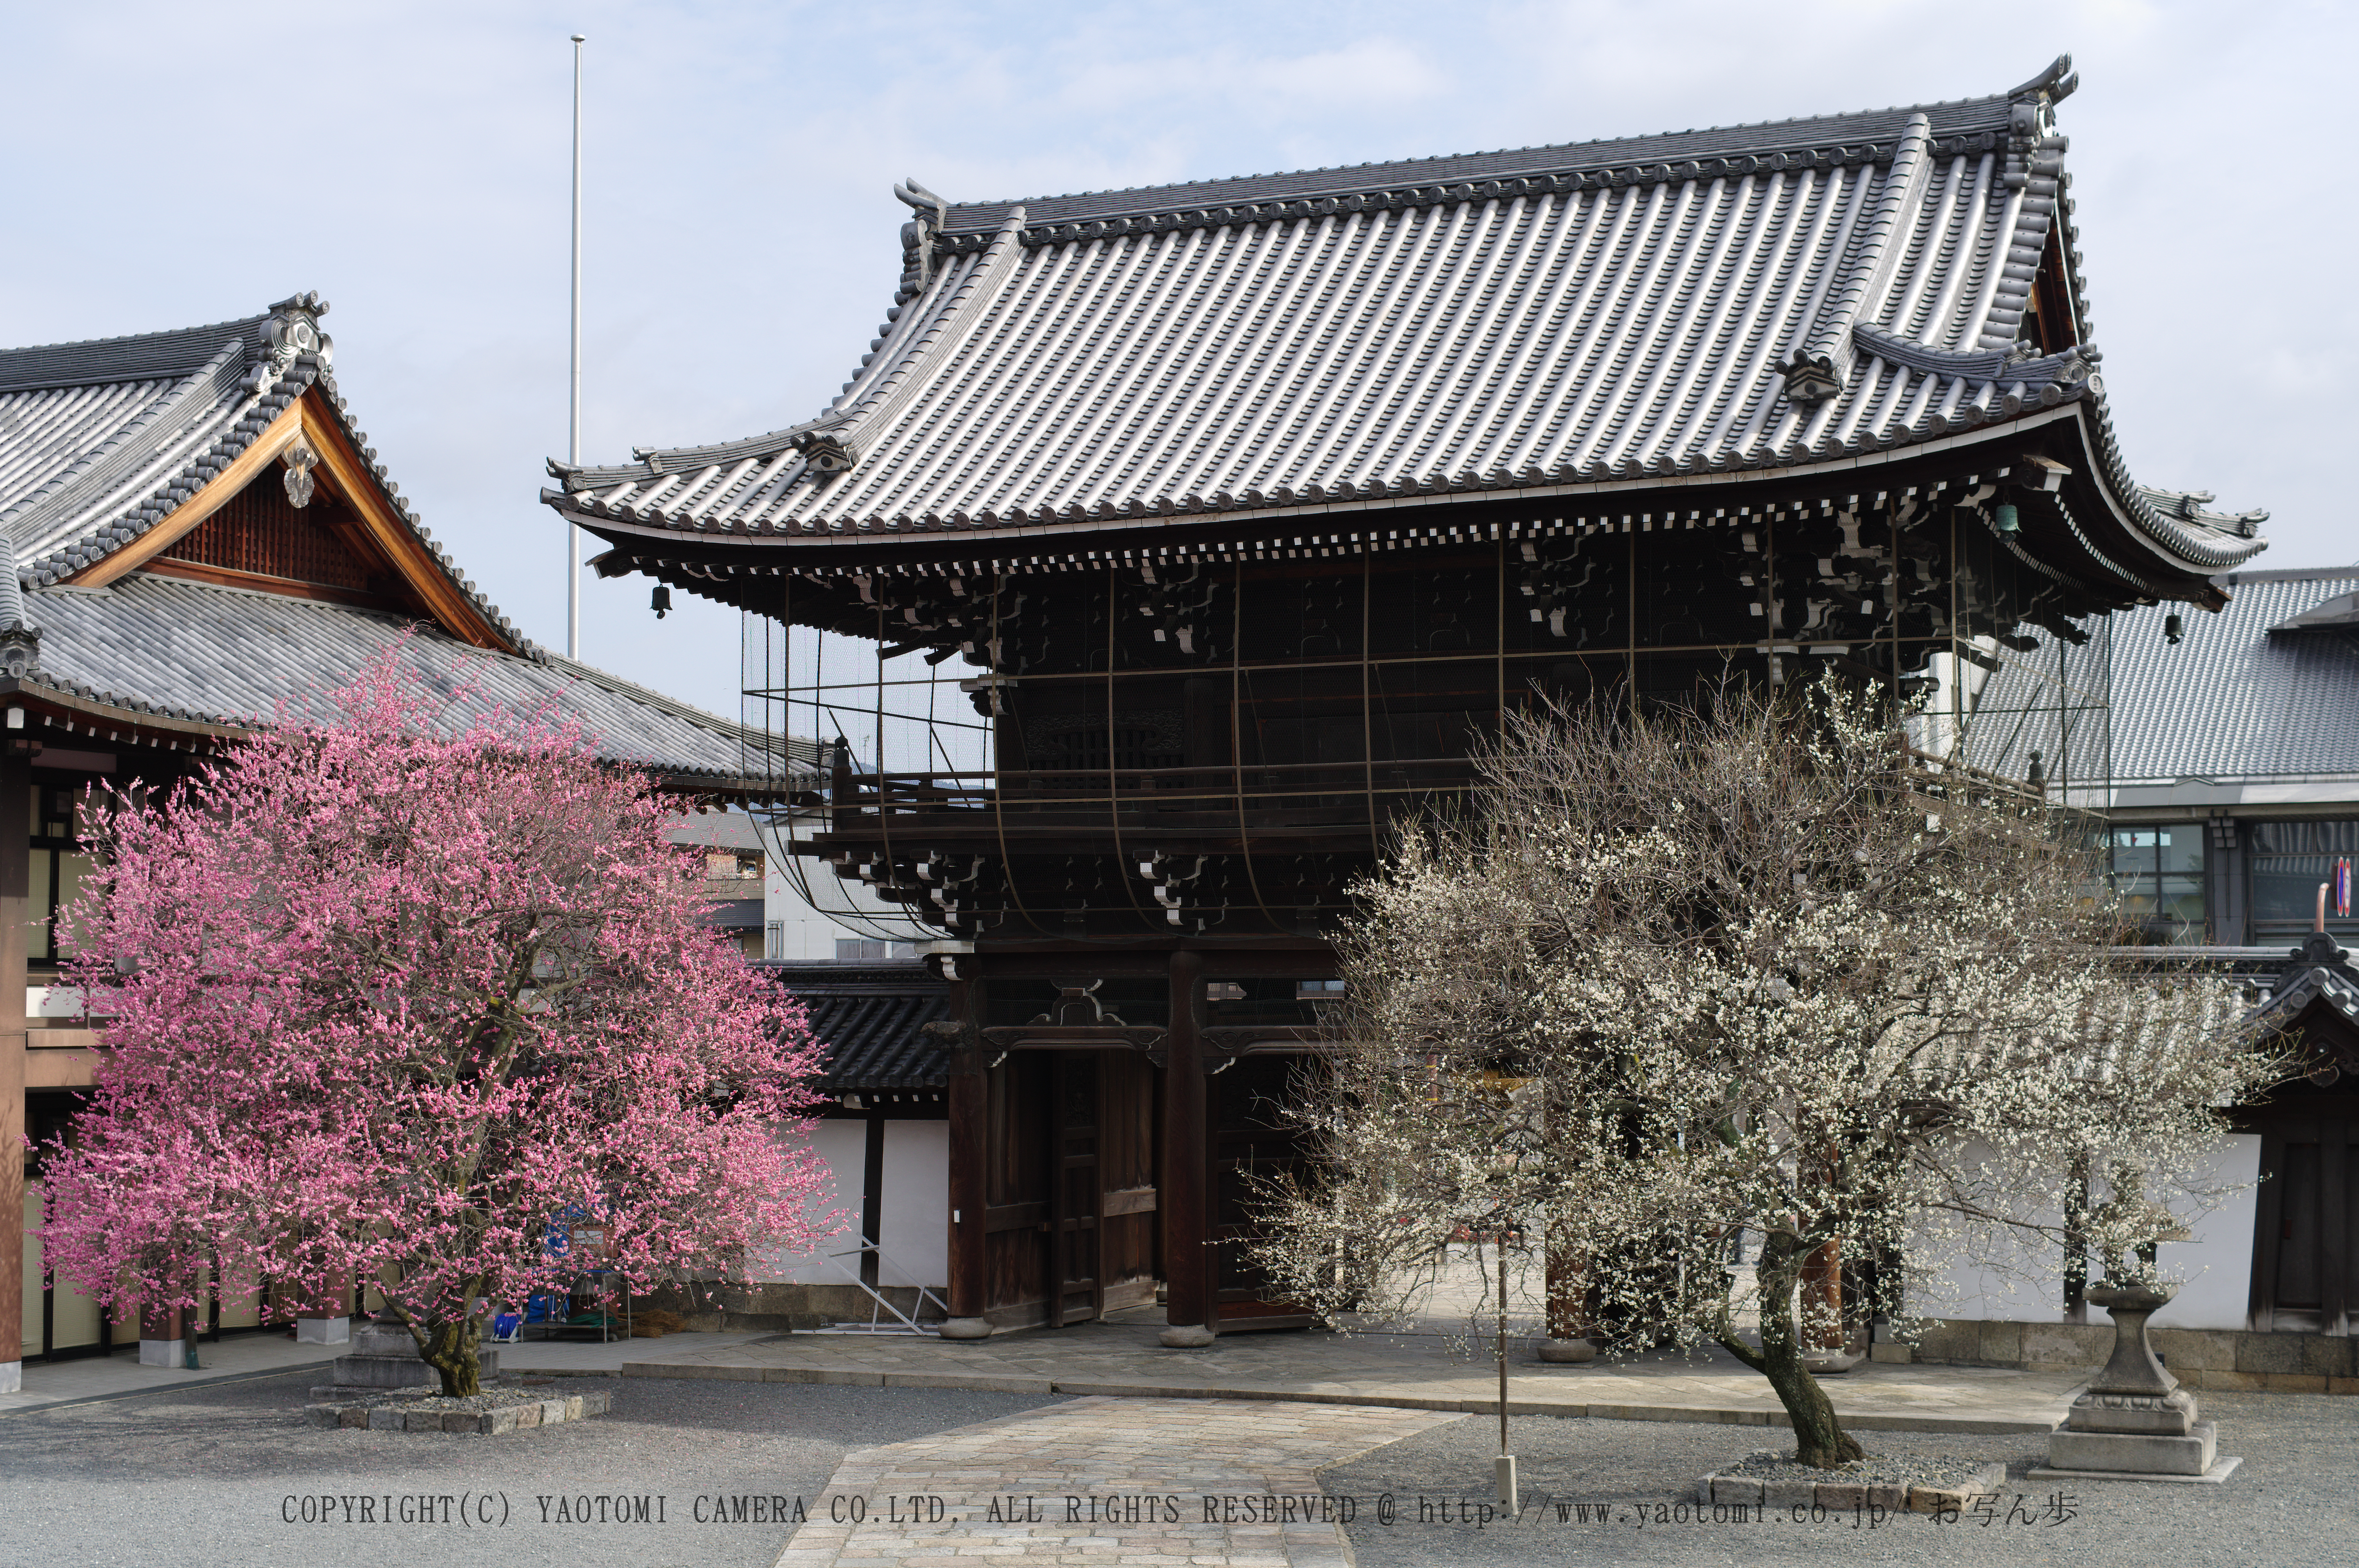 http://www.yaotomi.co.jp/blog/walk/PKP_1669%E6%96%87%E5%AD%97_F.jpg